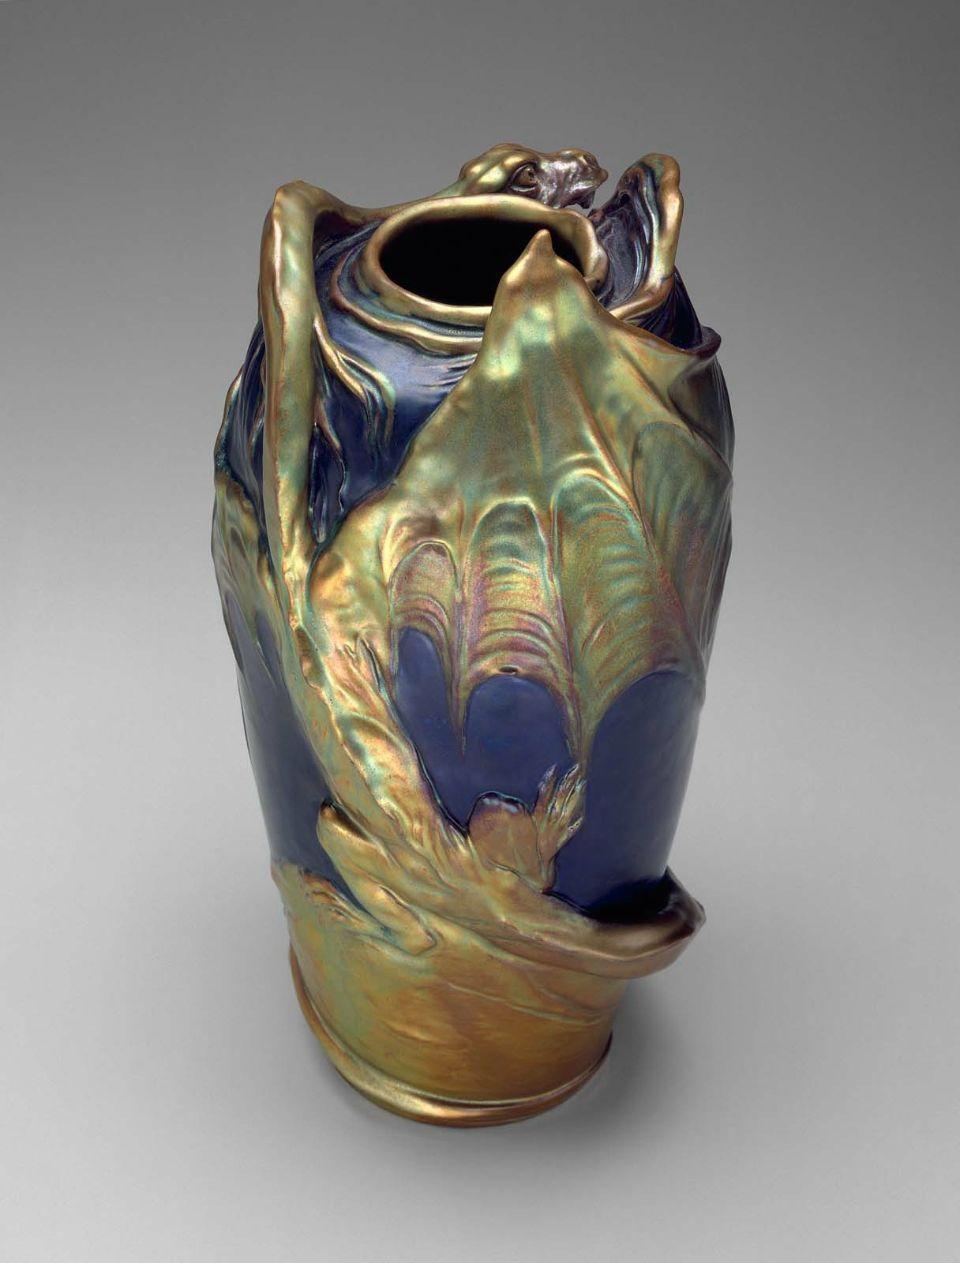 Ceramic earthenware with lustre glaze dragon wing art nouveau vase ceramic earthenware with lustre glaze dragon wing art nouveau vase lajos mack by zsolnay manufactory reviewsmspy